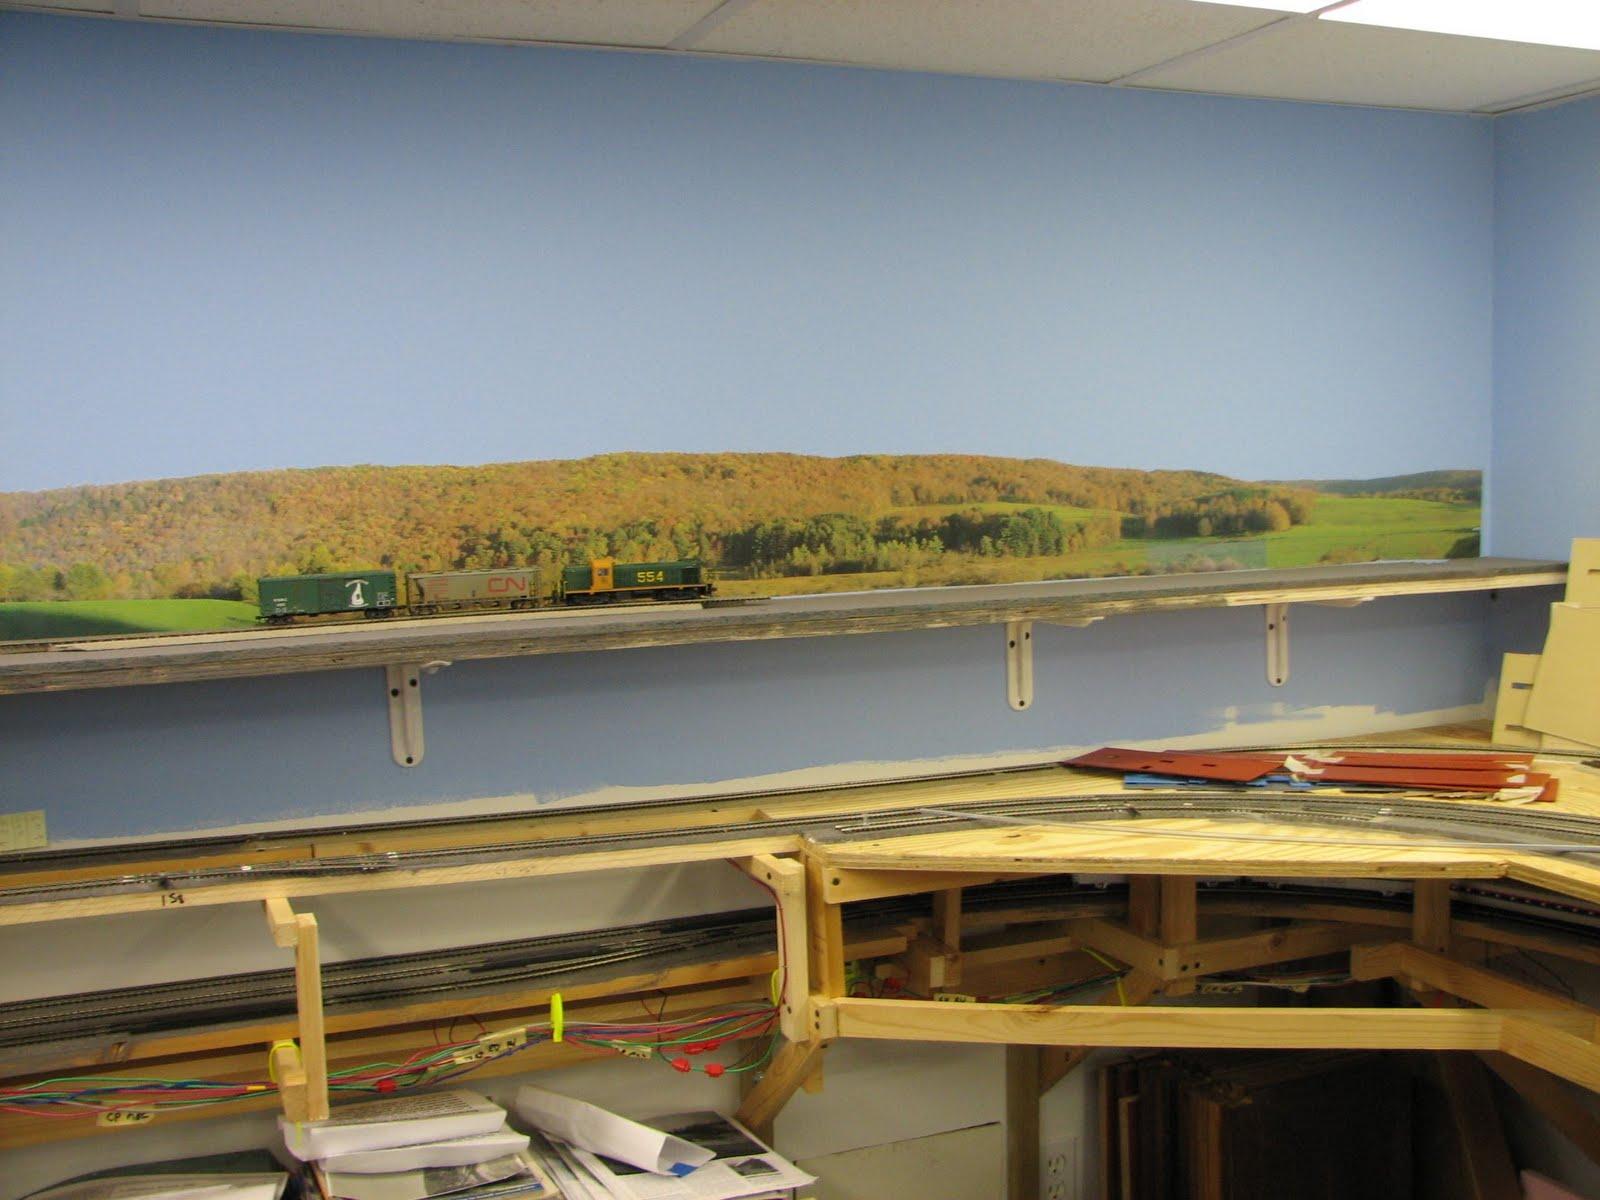 Mike mcnamara 39 s northeast kingdom model railroad photo - Model railroad backdrops ...